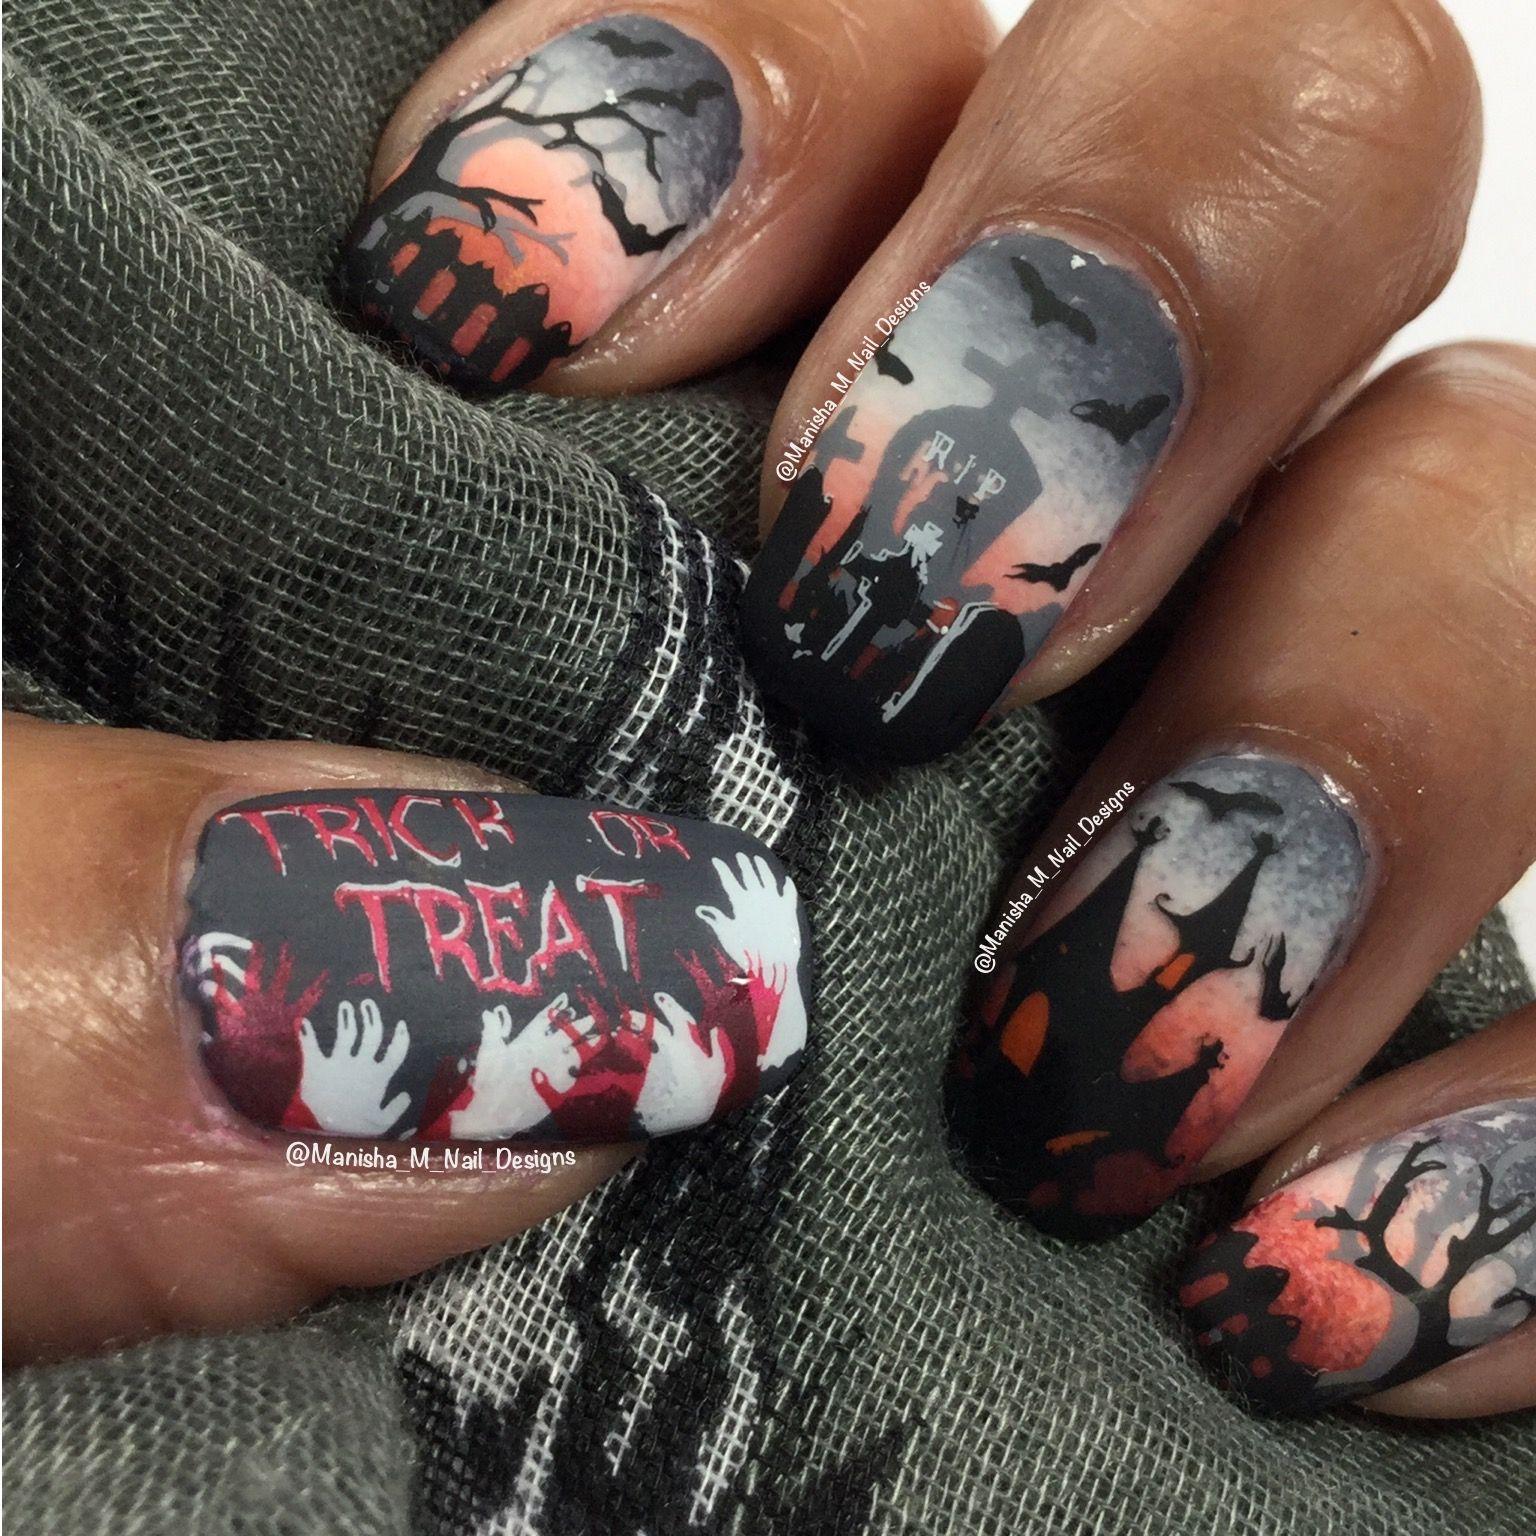 Pin by Manisha M. on Nail Art - Hehe | Pinterest | Designs nail art